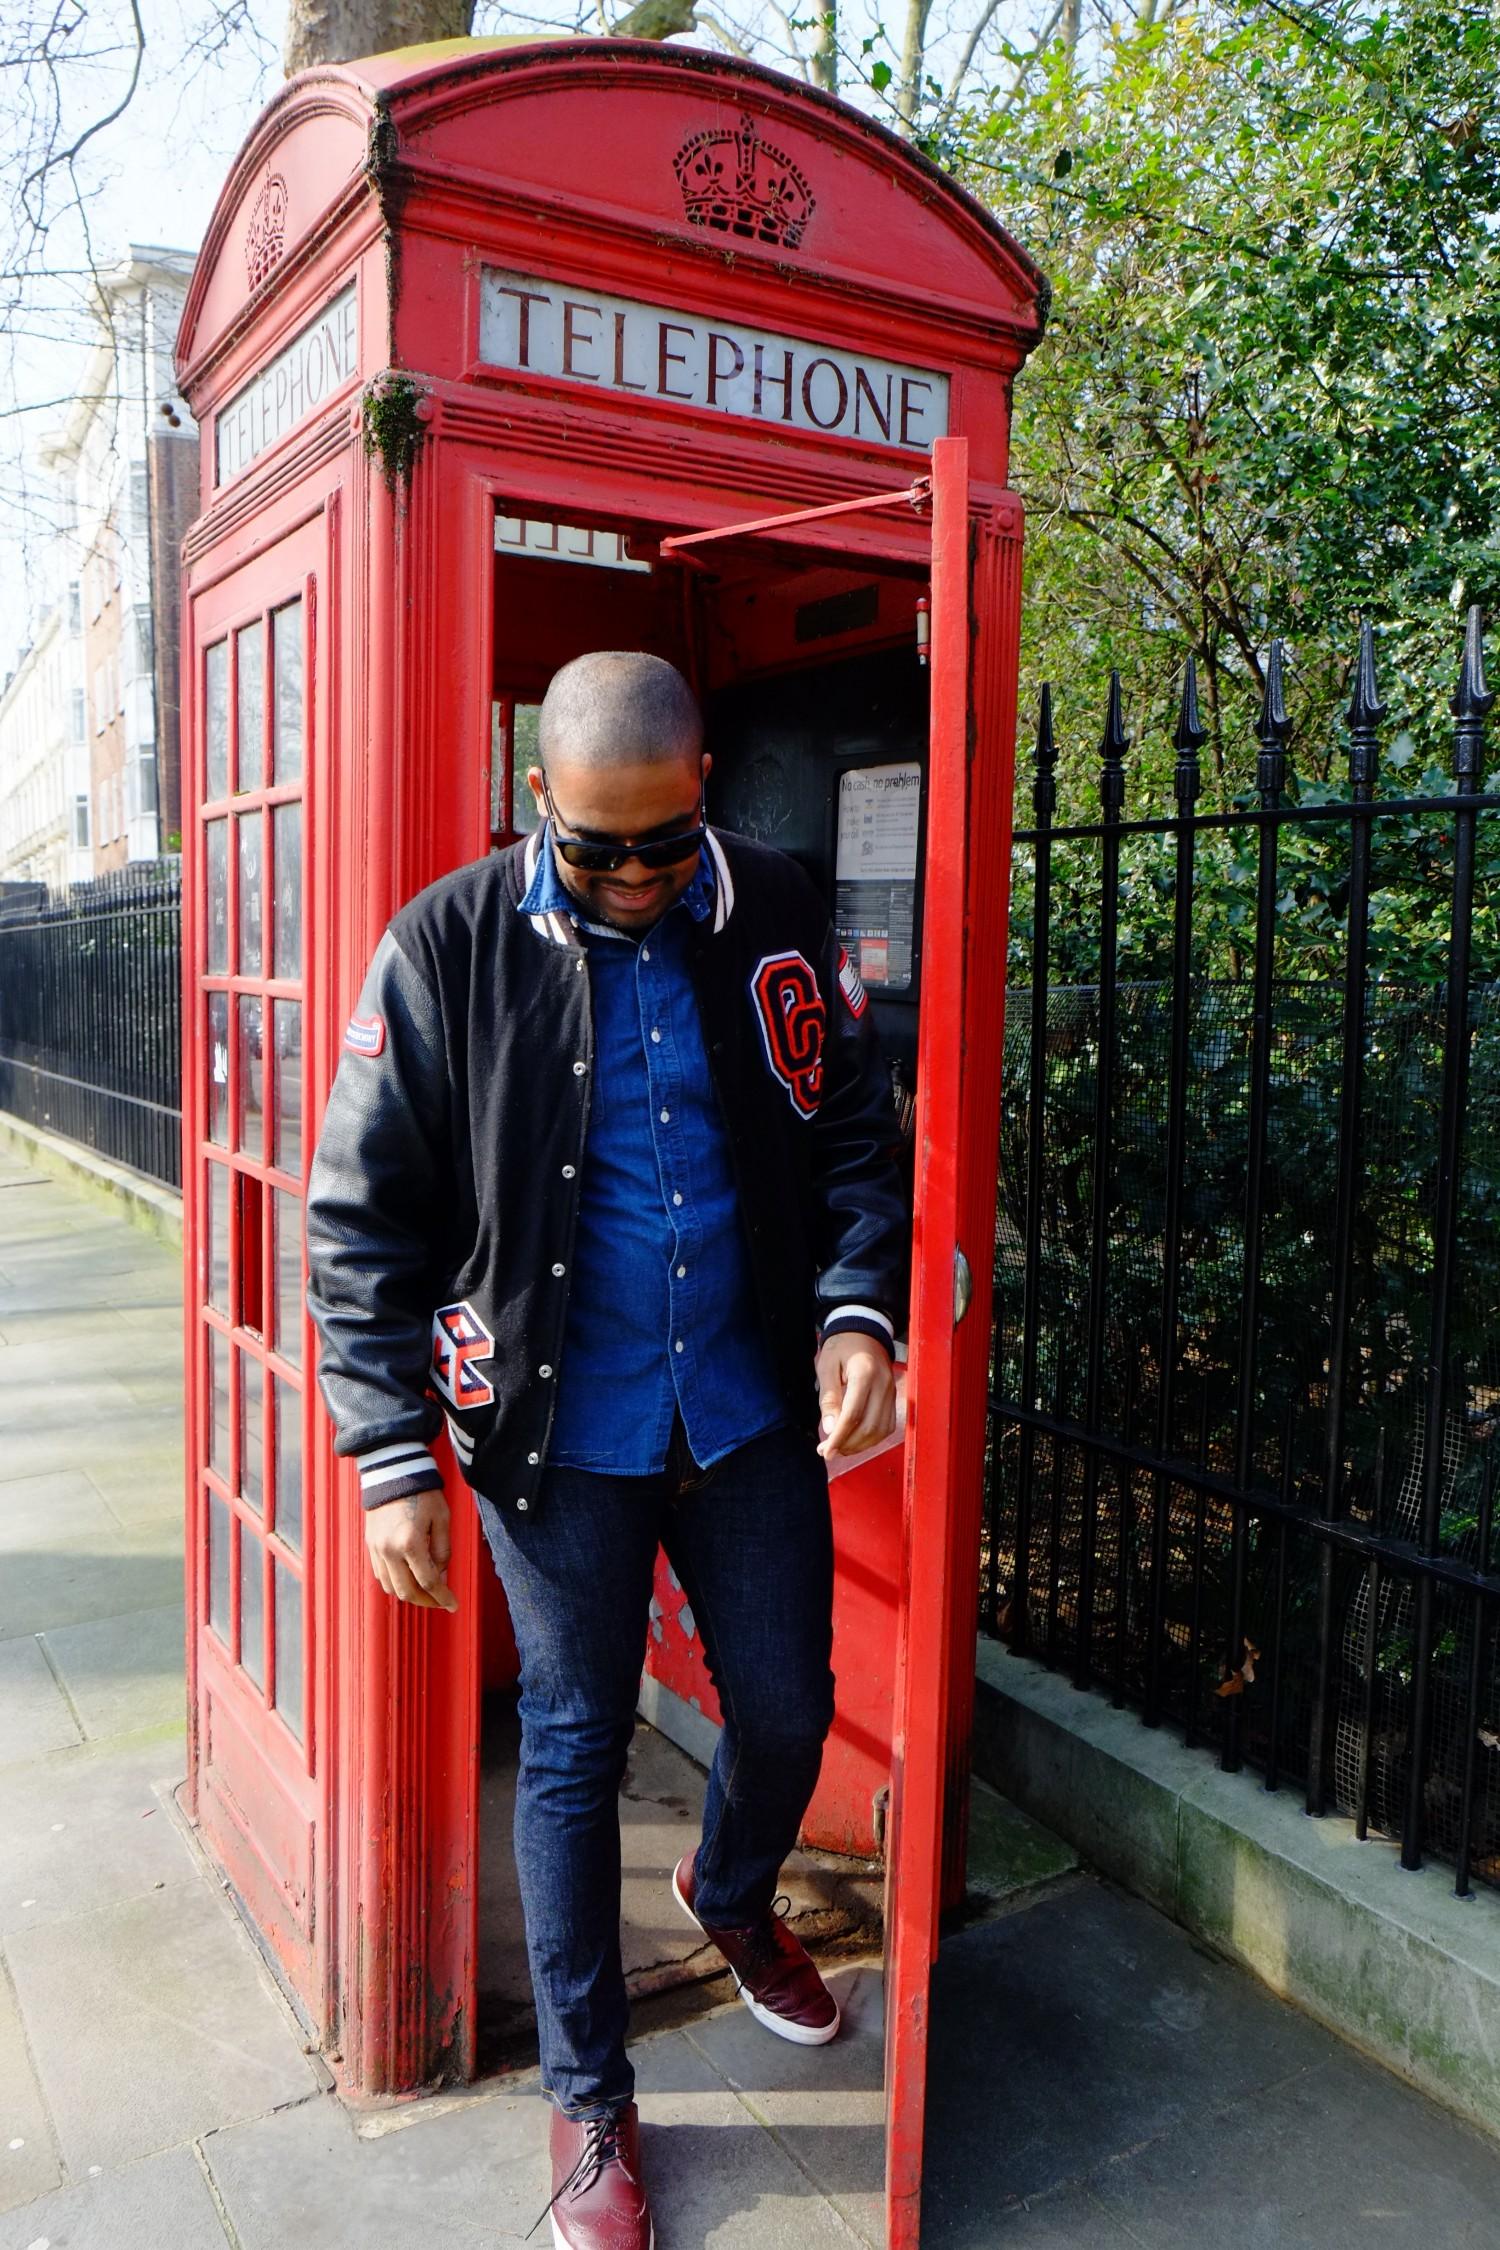 Bucket list London phone box